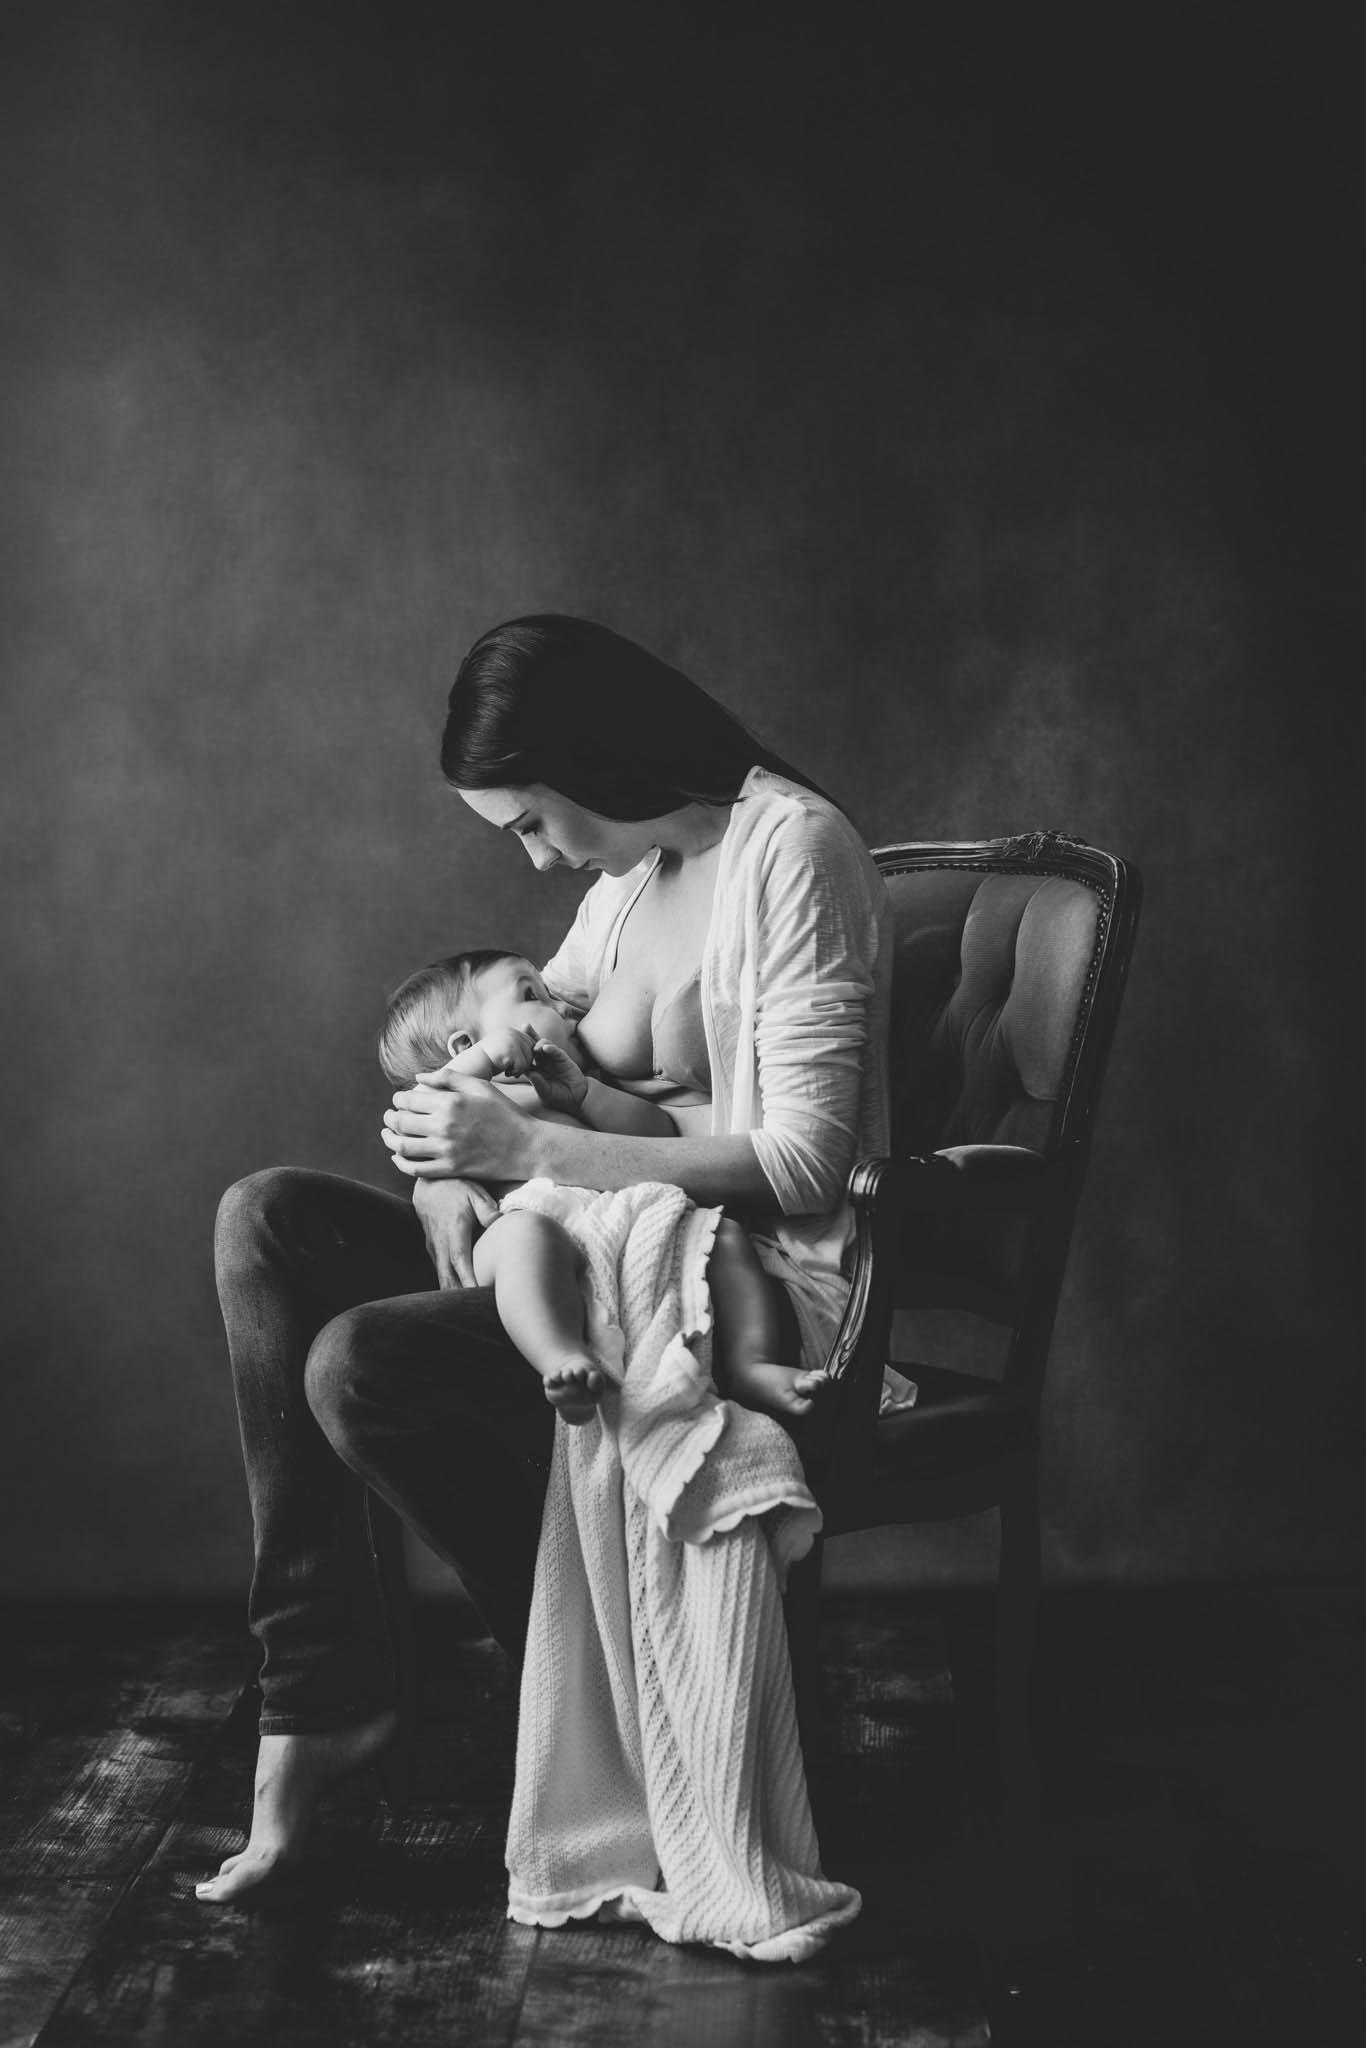 black and white portrait of mum breastfeeding baby girl on grey background by Family photographer Lancashire